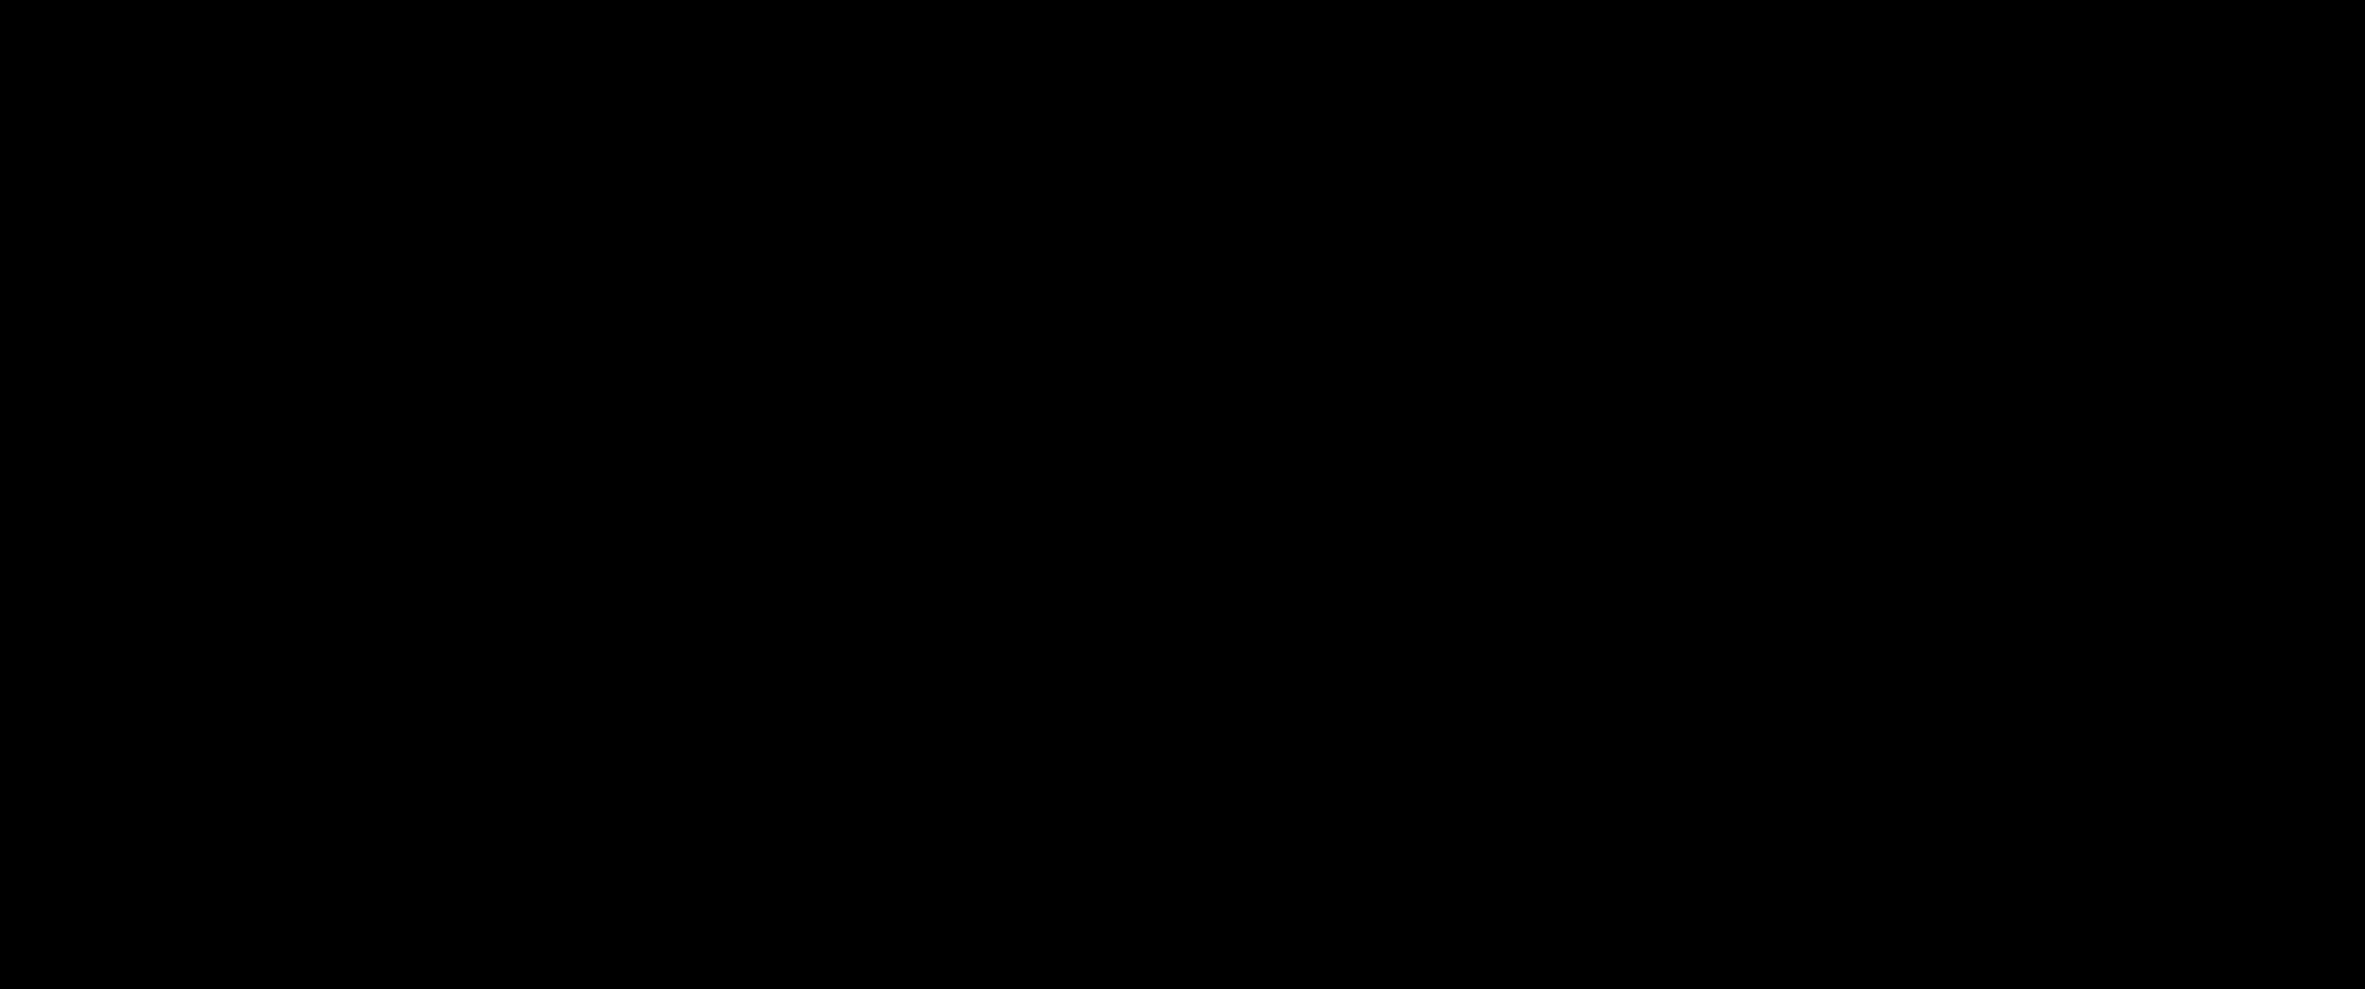 WYSSEN DEFENCE Mantelrohr UltraCompact für STGW57